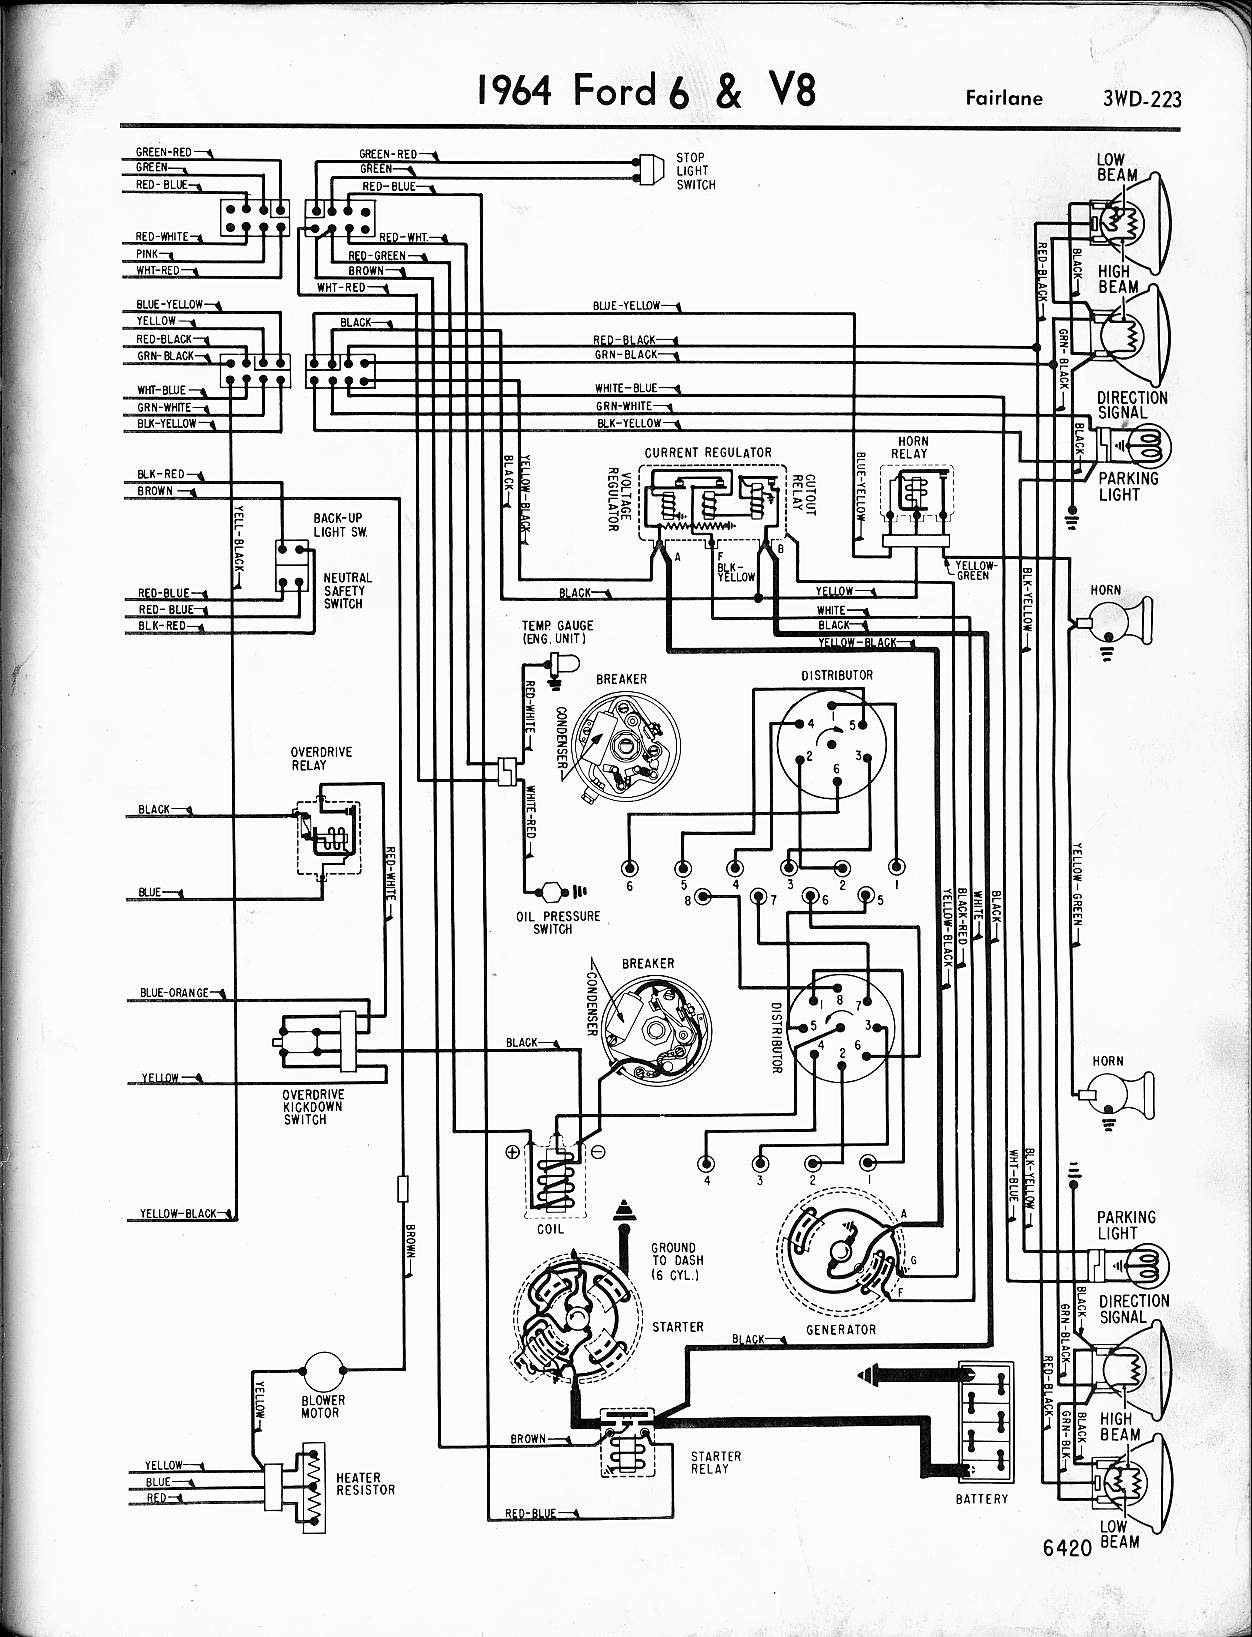 64 ford f100 wiring wiring diagram todays64 f100 wiring diagram wiring diagrams 1966 ford f100 wiring schematic 64 ford f100 wiring